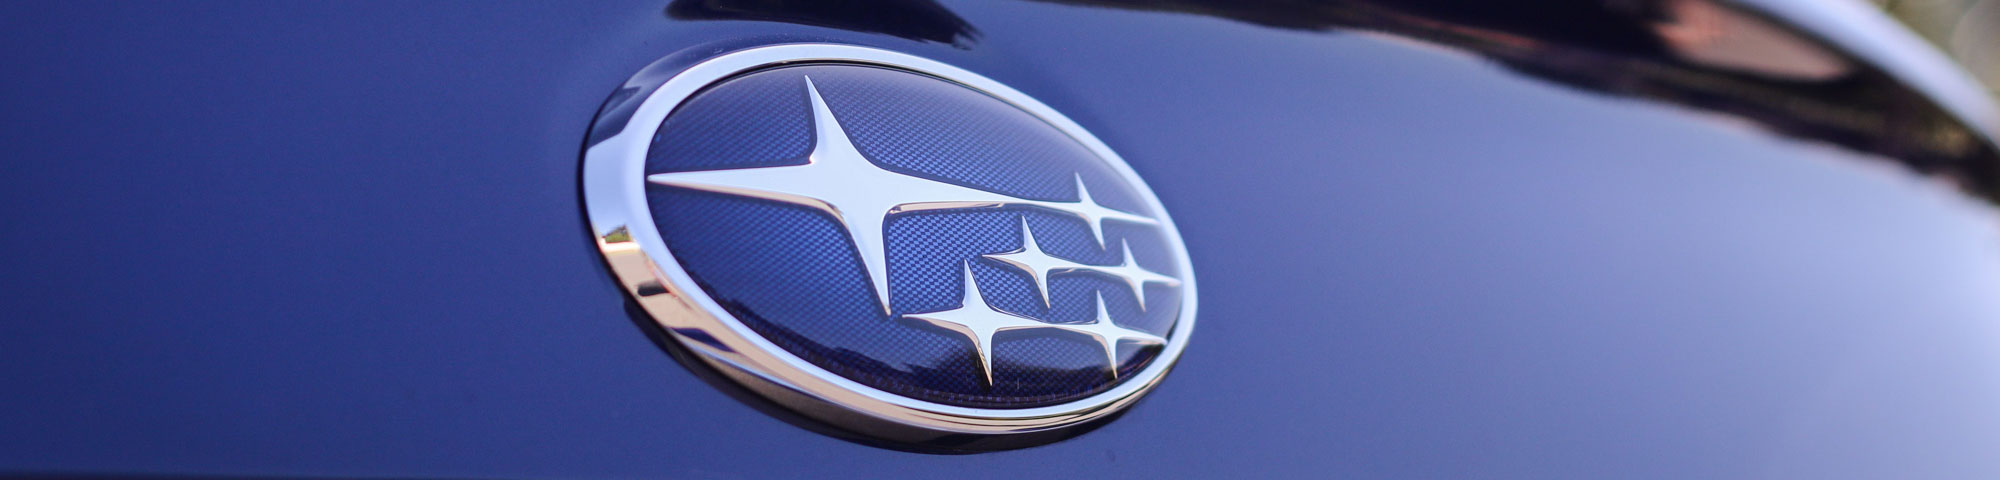 CLMS - Manufacturer - Subaru